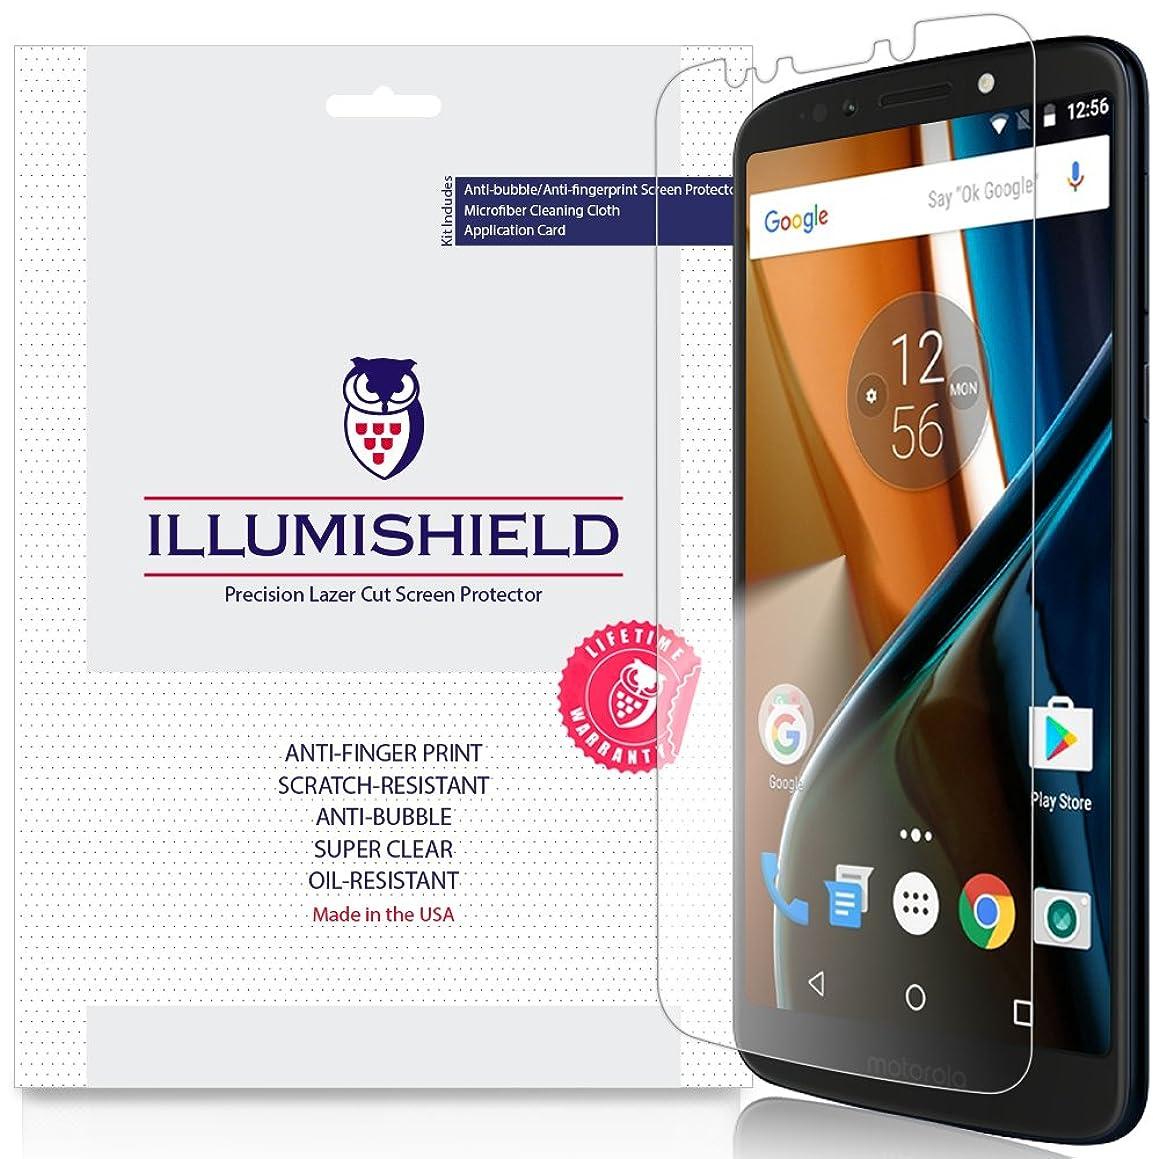 Moto G6 Play Screen Protector [3-Pack], iLLumiShield Screen Protector for Moto G6 Play Clear HD Shield with Anti-Bubble & Anti-Fingerprint Film